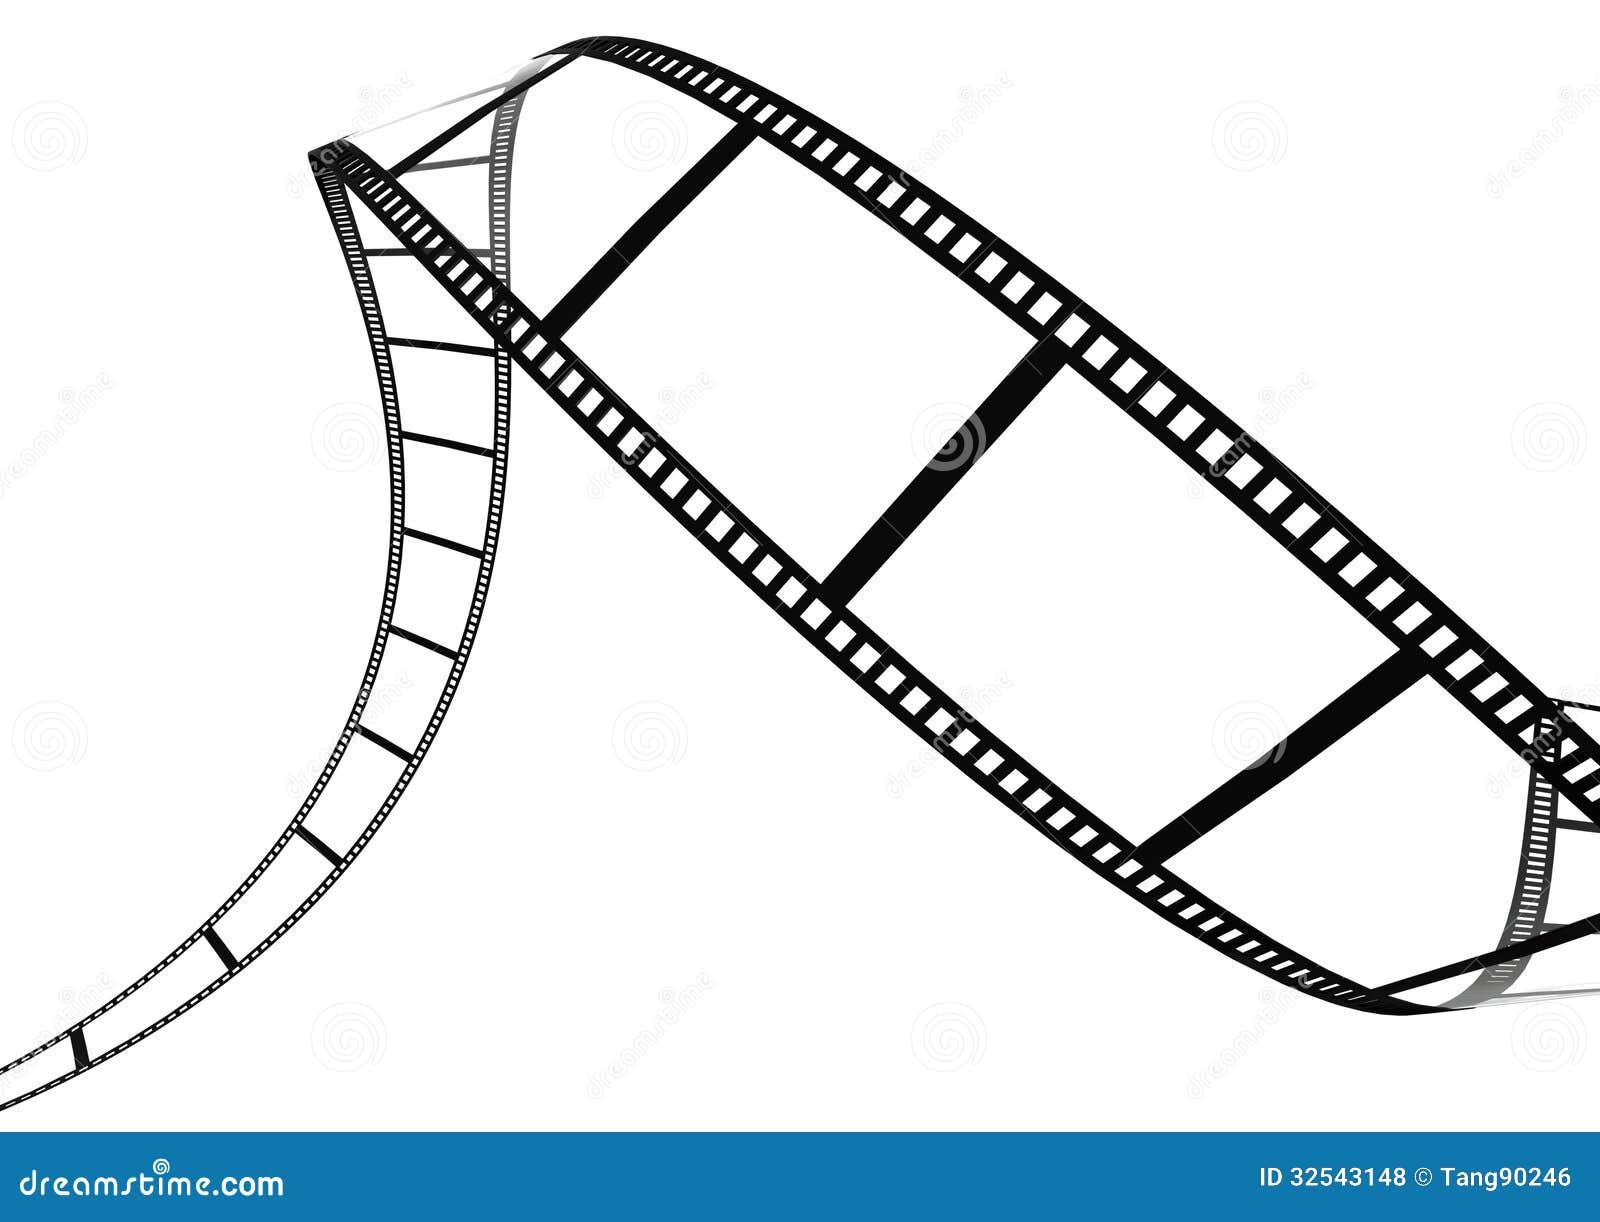 Film strip artwork